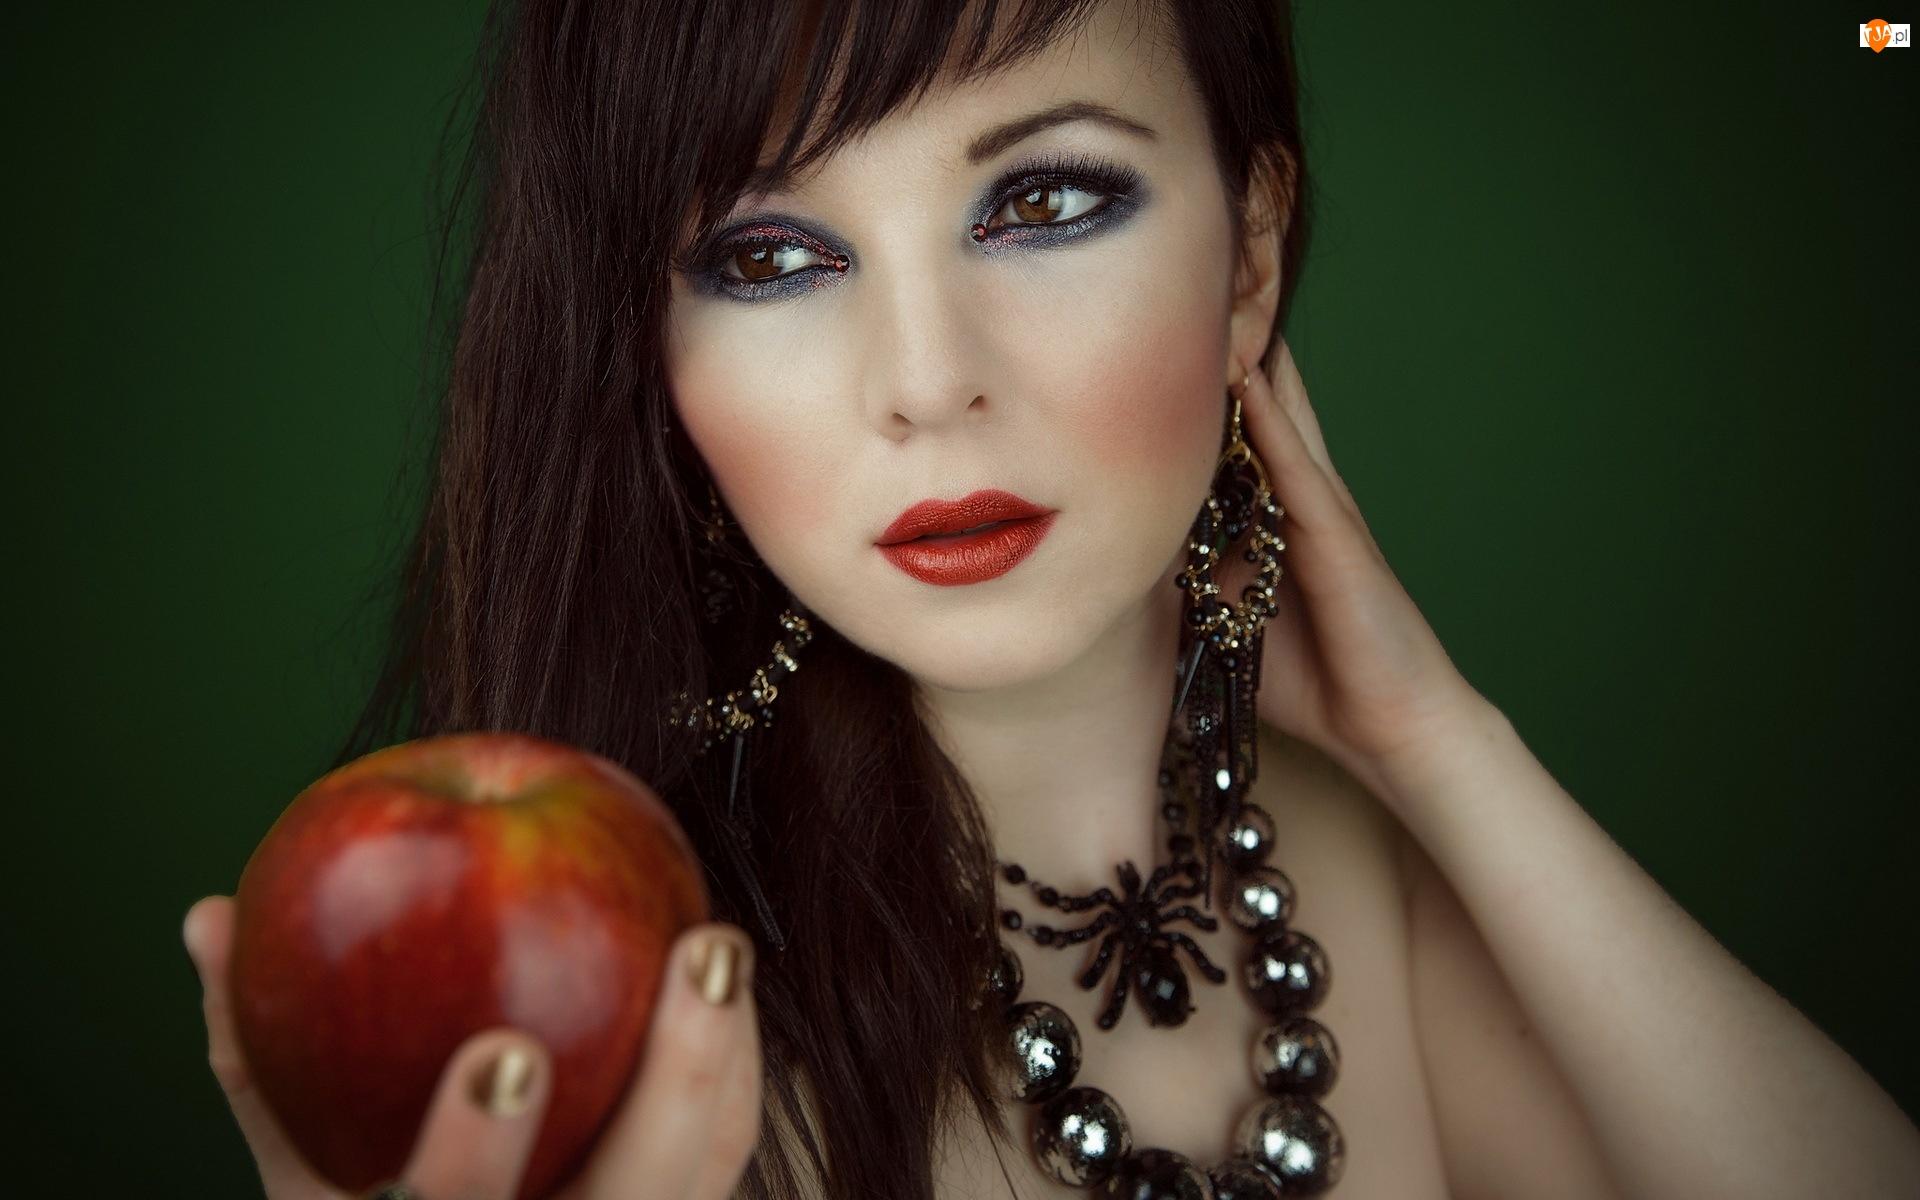 Kobieta, Jabłko, Biżuteria, Makijaż